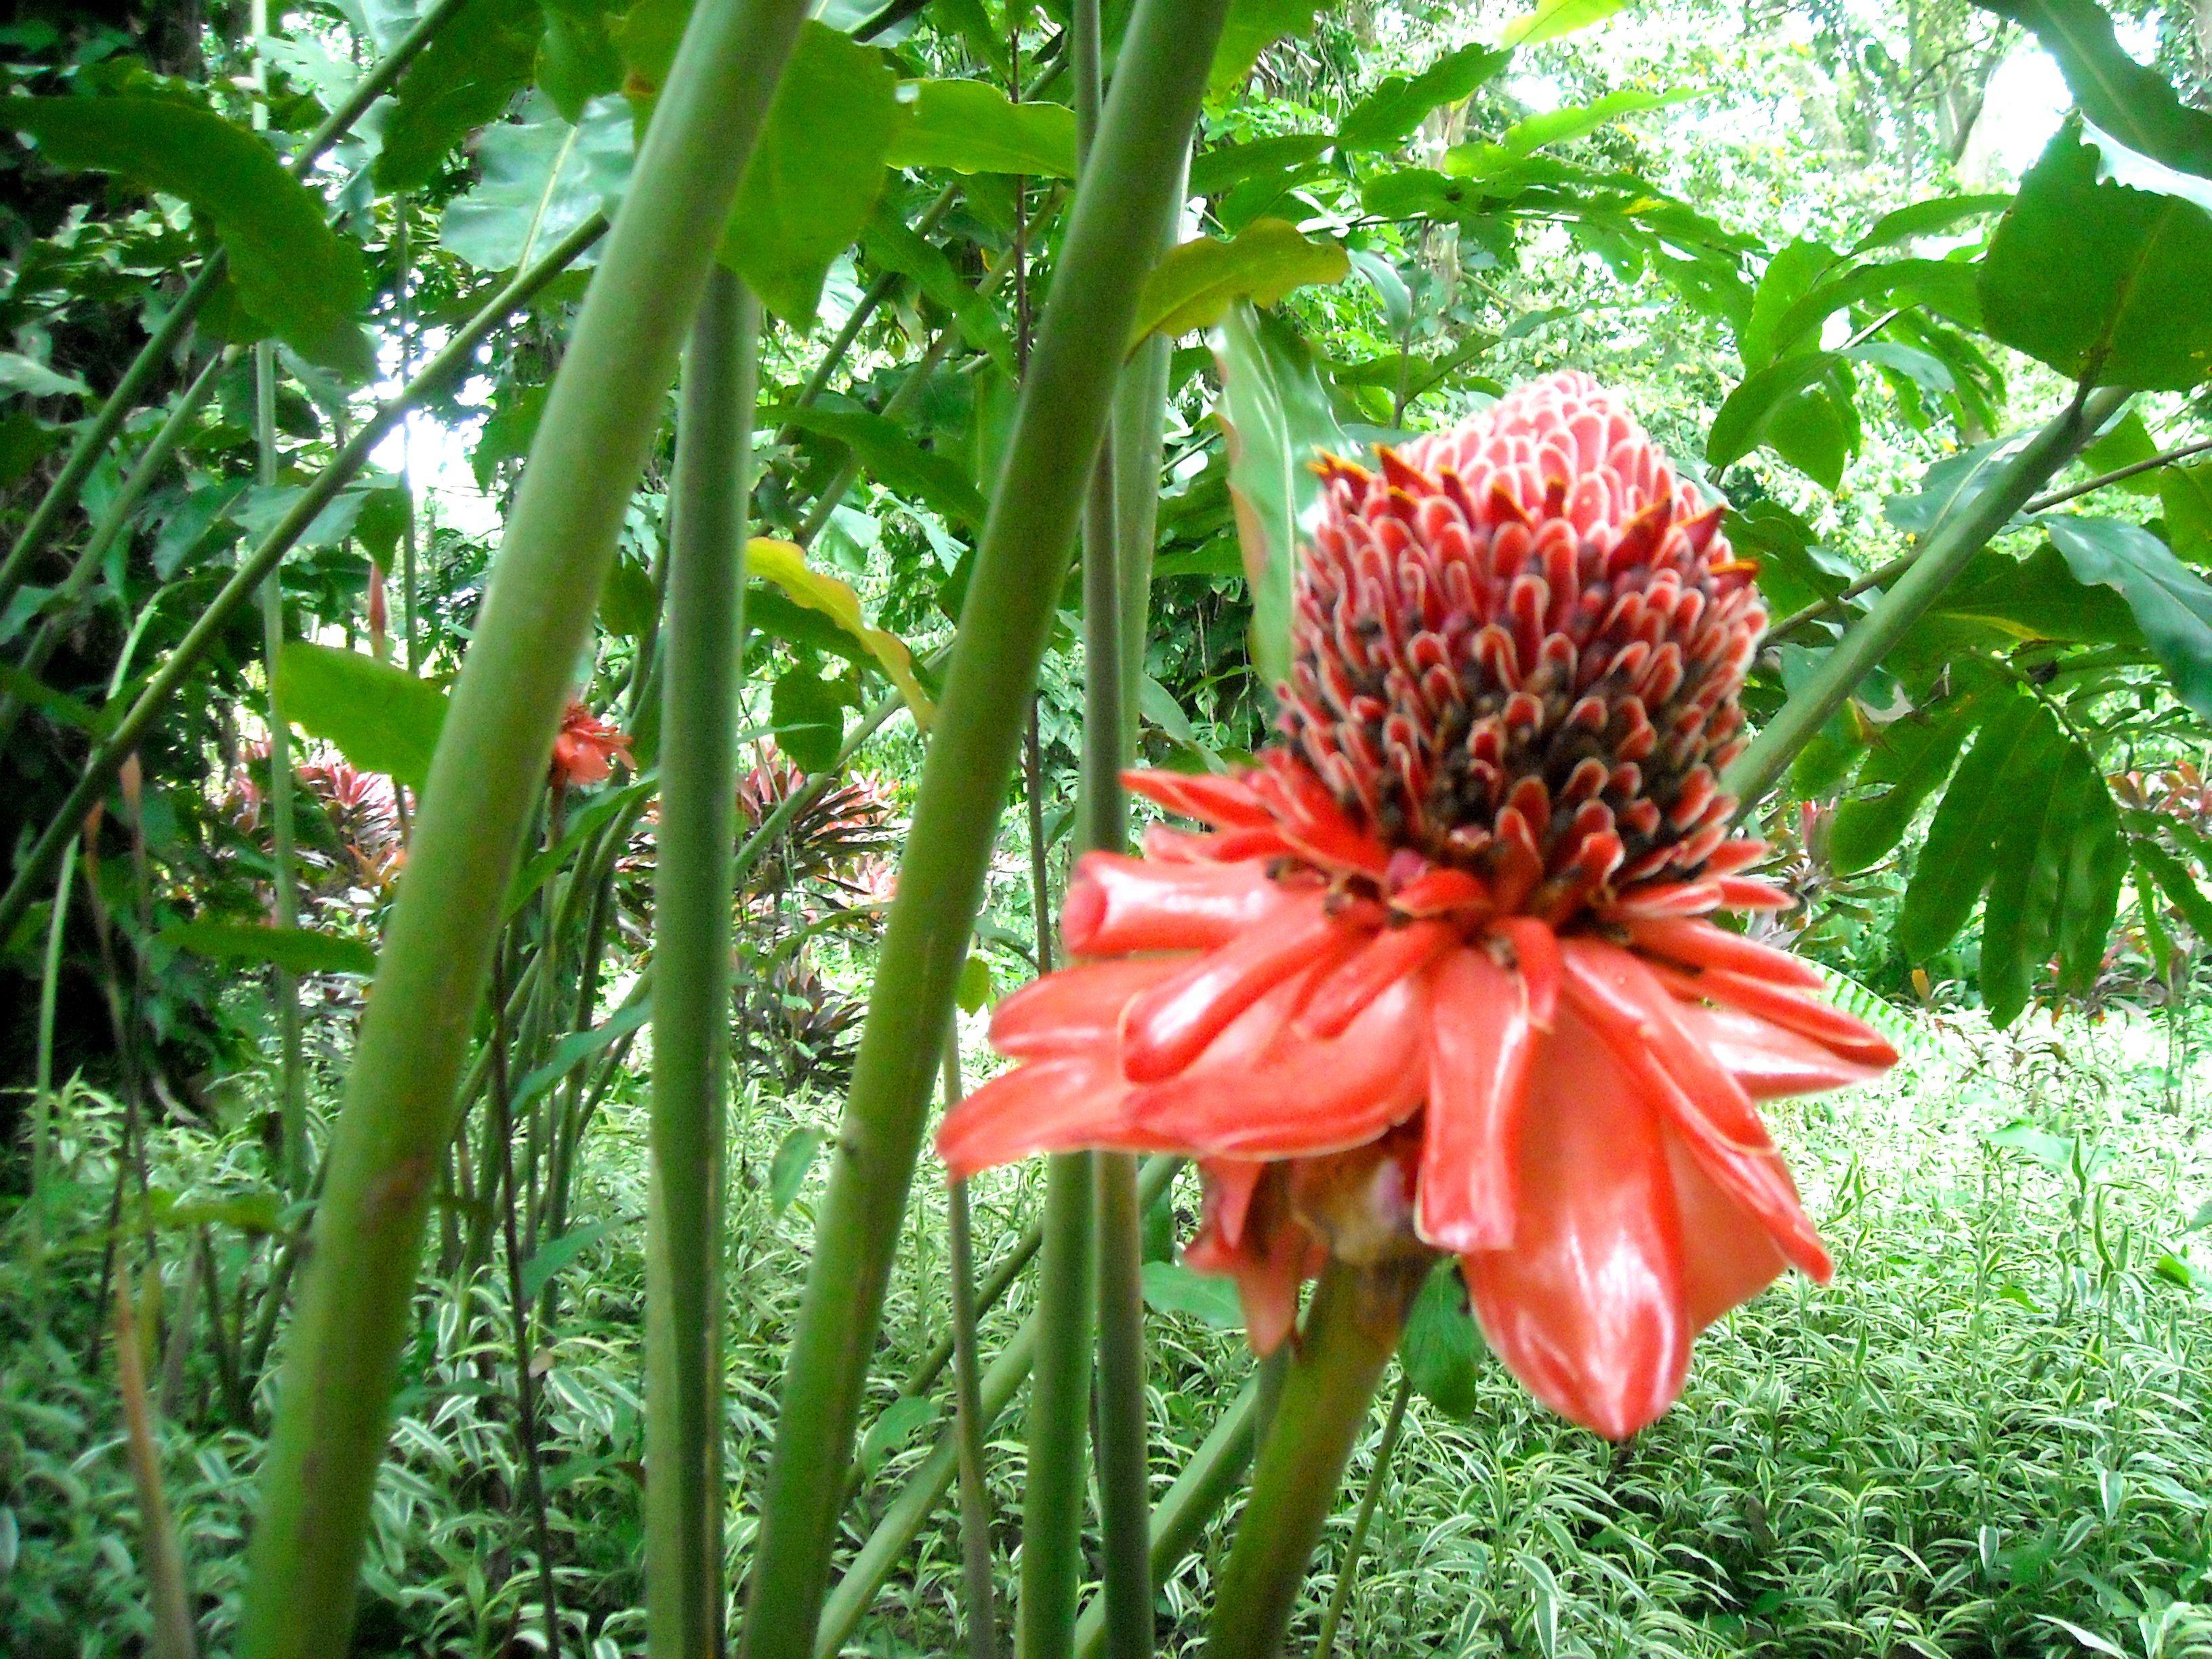 Flores exoticas on pinterest 21 pins for Plantas exoticas online